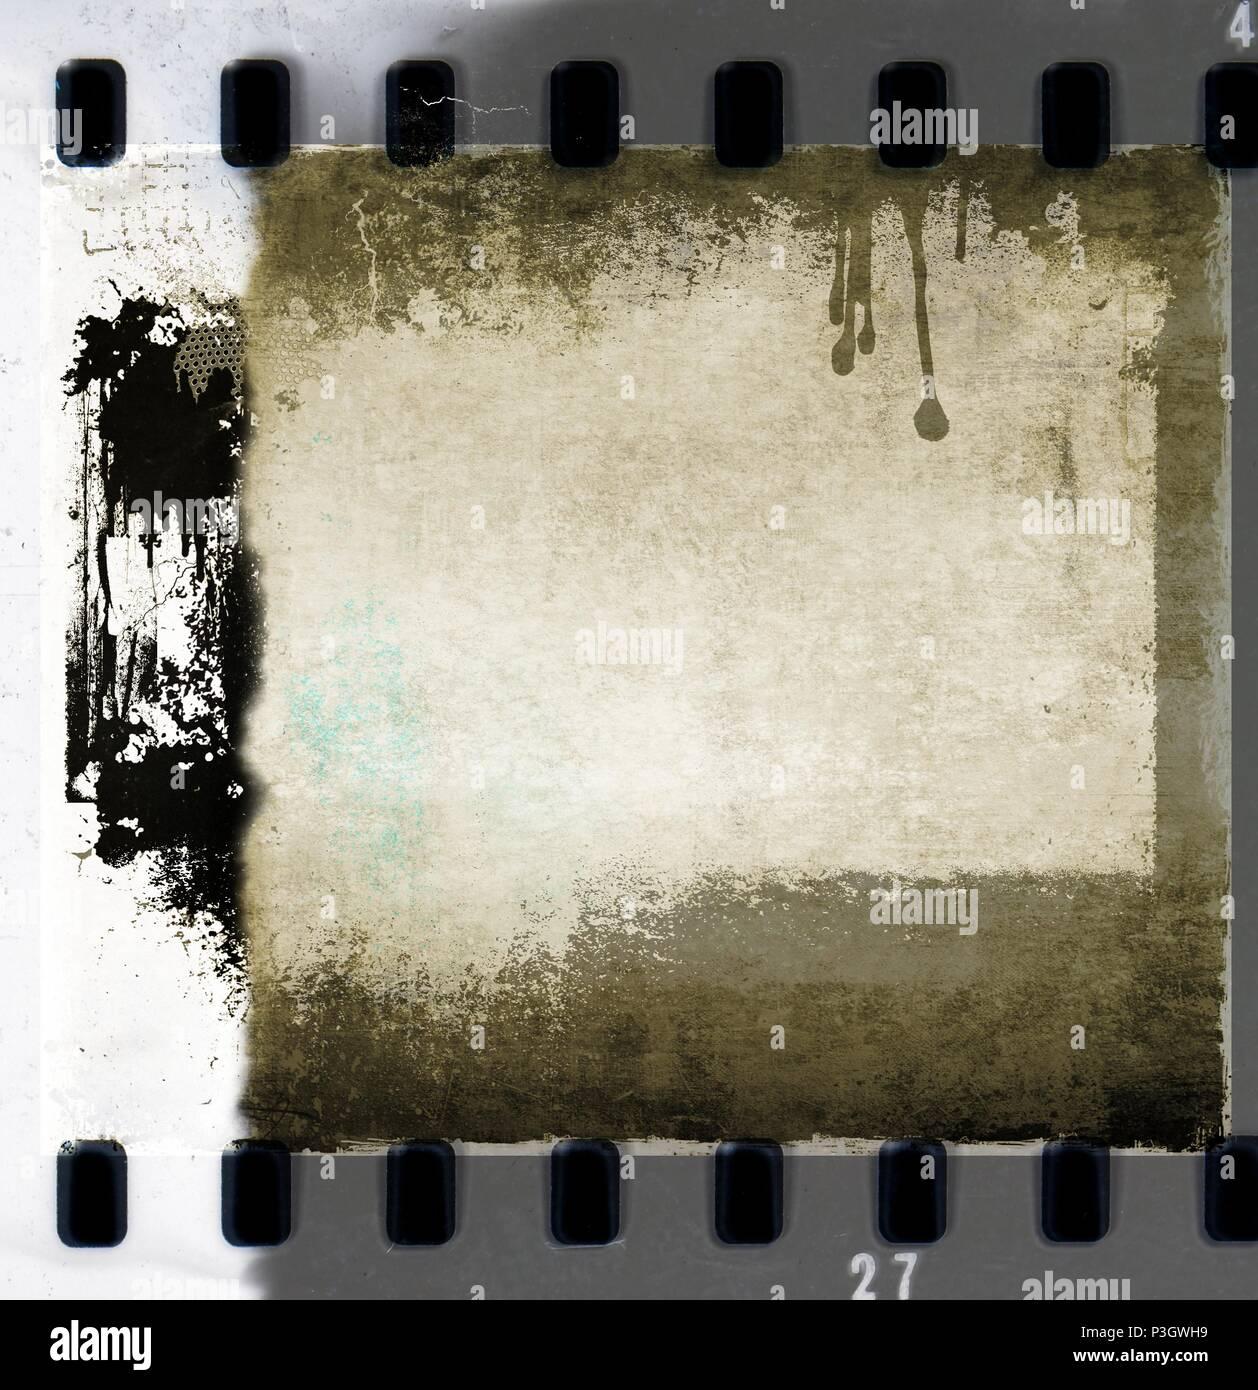 Retro film strip frames in sepia tones with copy space. - Stock Image